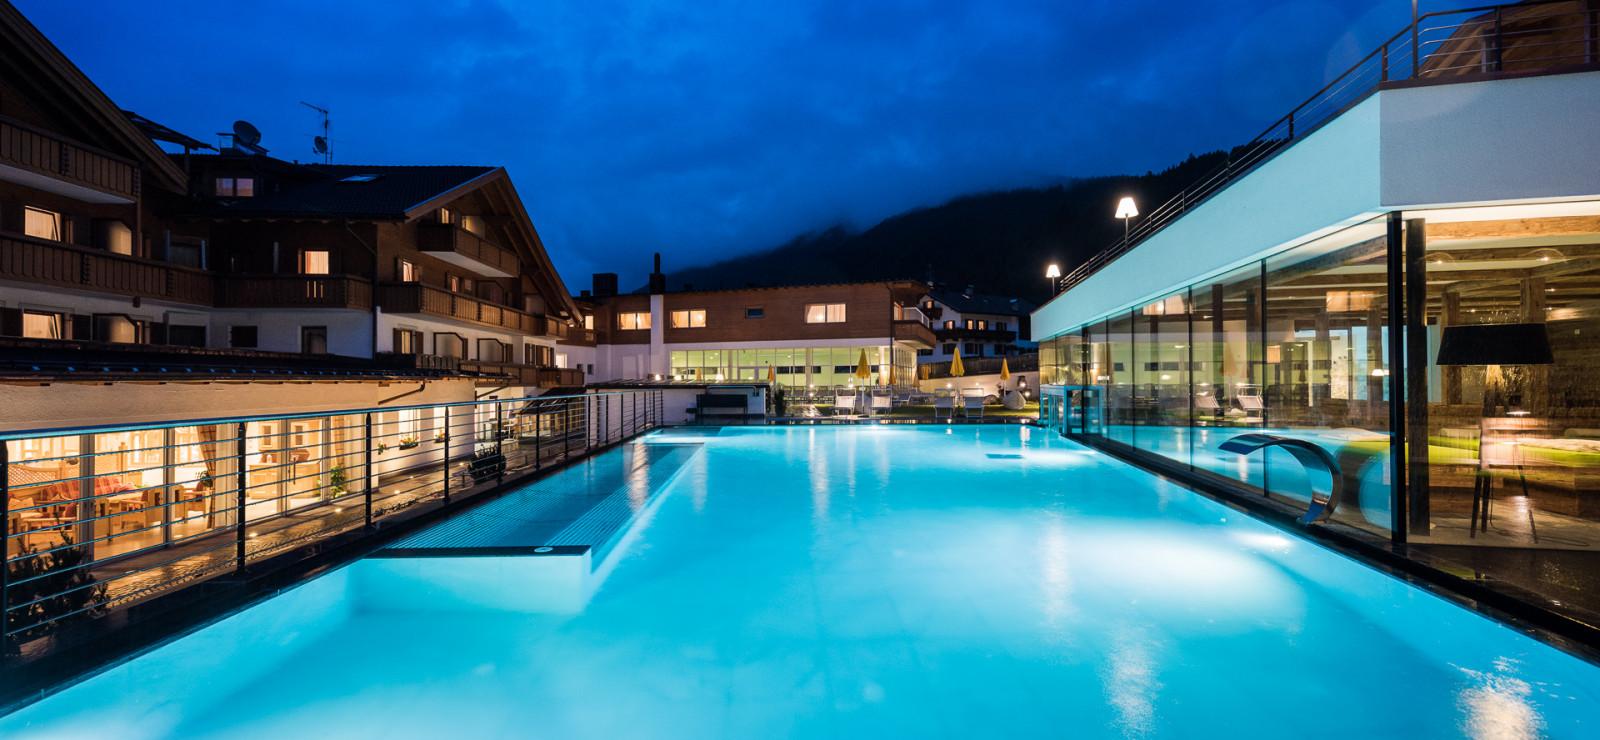 Wellnesshotels dolomiten s dtirol die besten hotels for Design hotel dolomiten